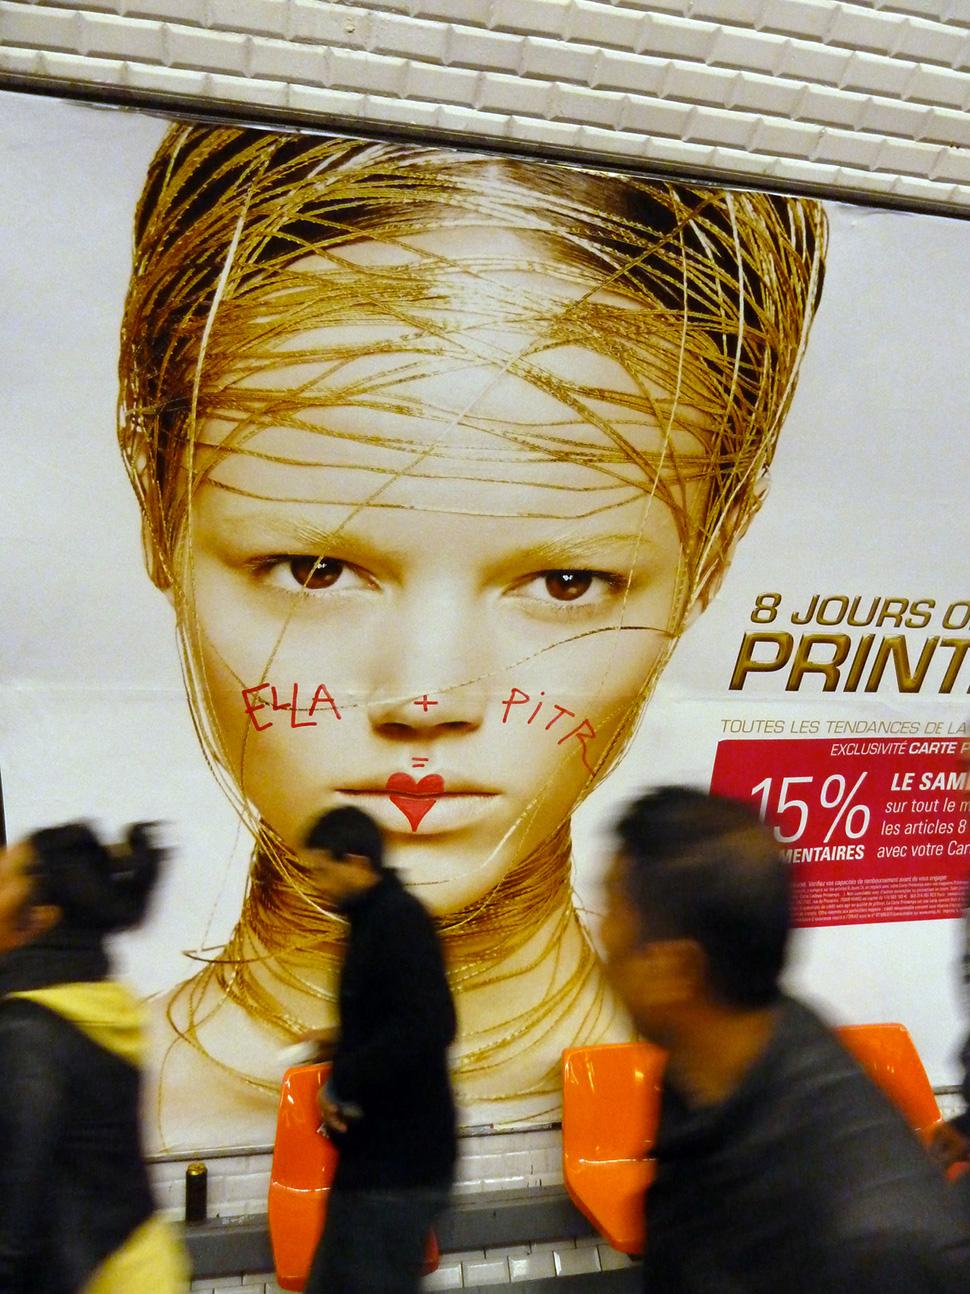 Ella-&-Pitr-paris-metro-graffiti-street-art-ubrain-les-papiers-peintres-france-2014_1-web